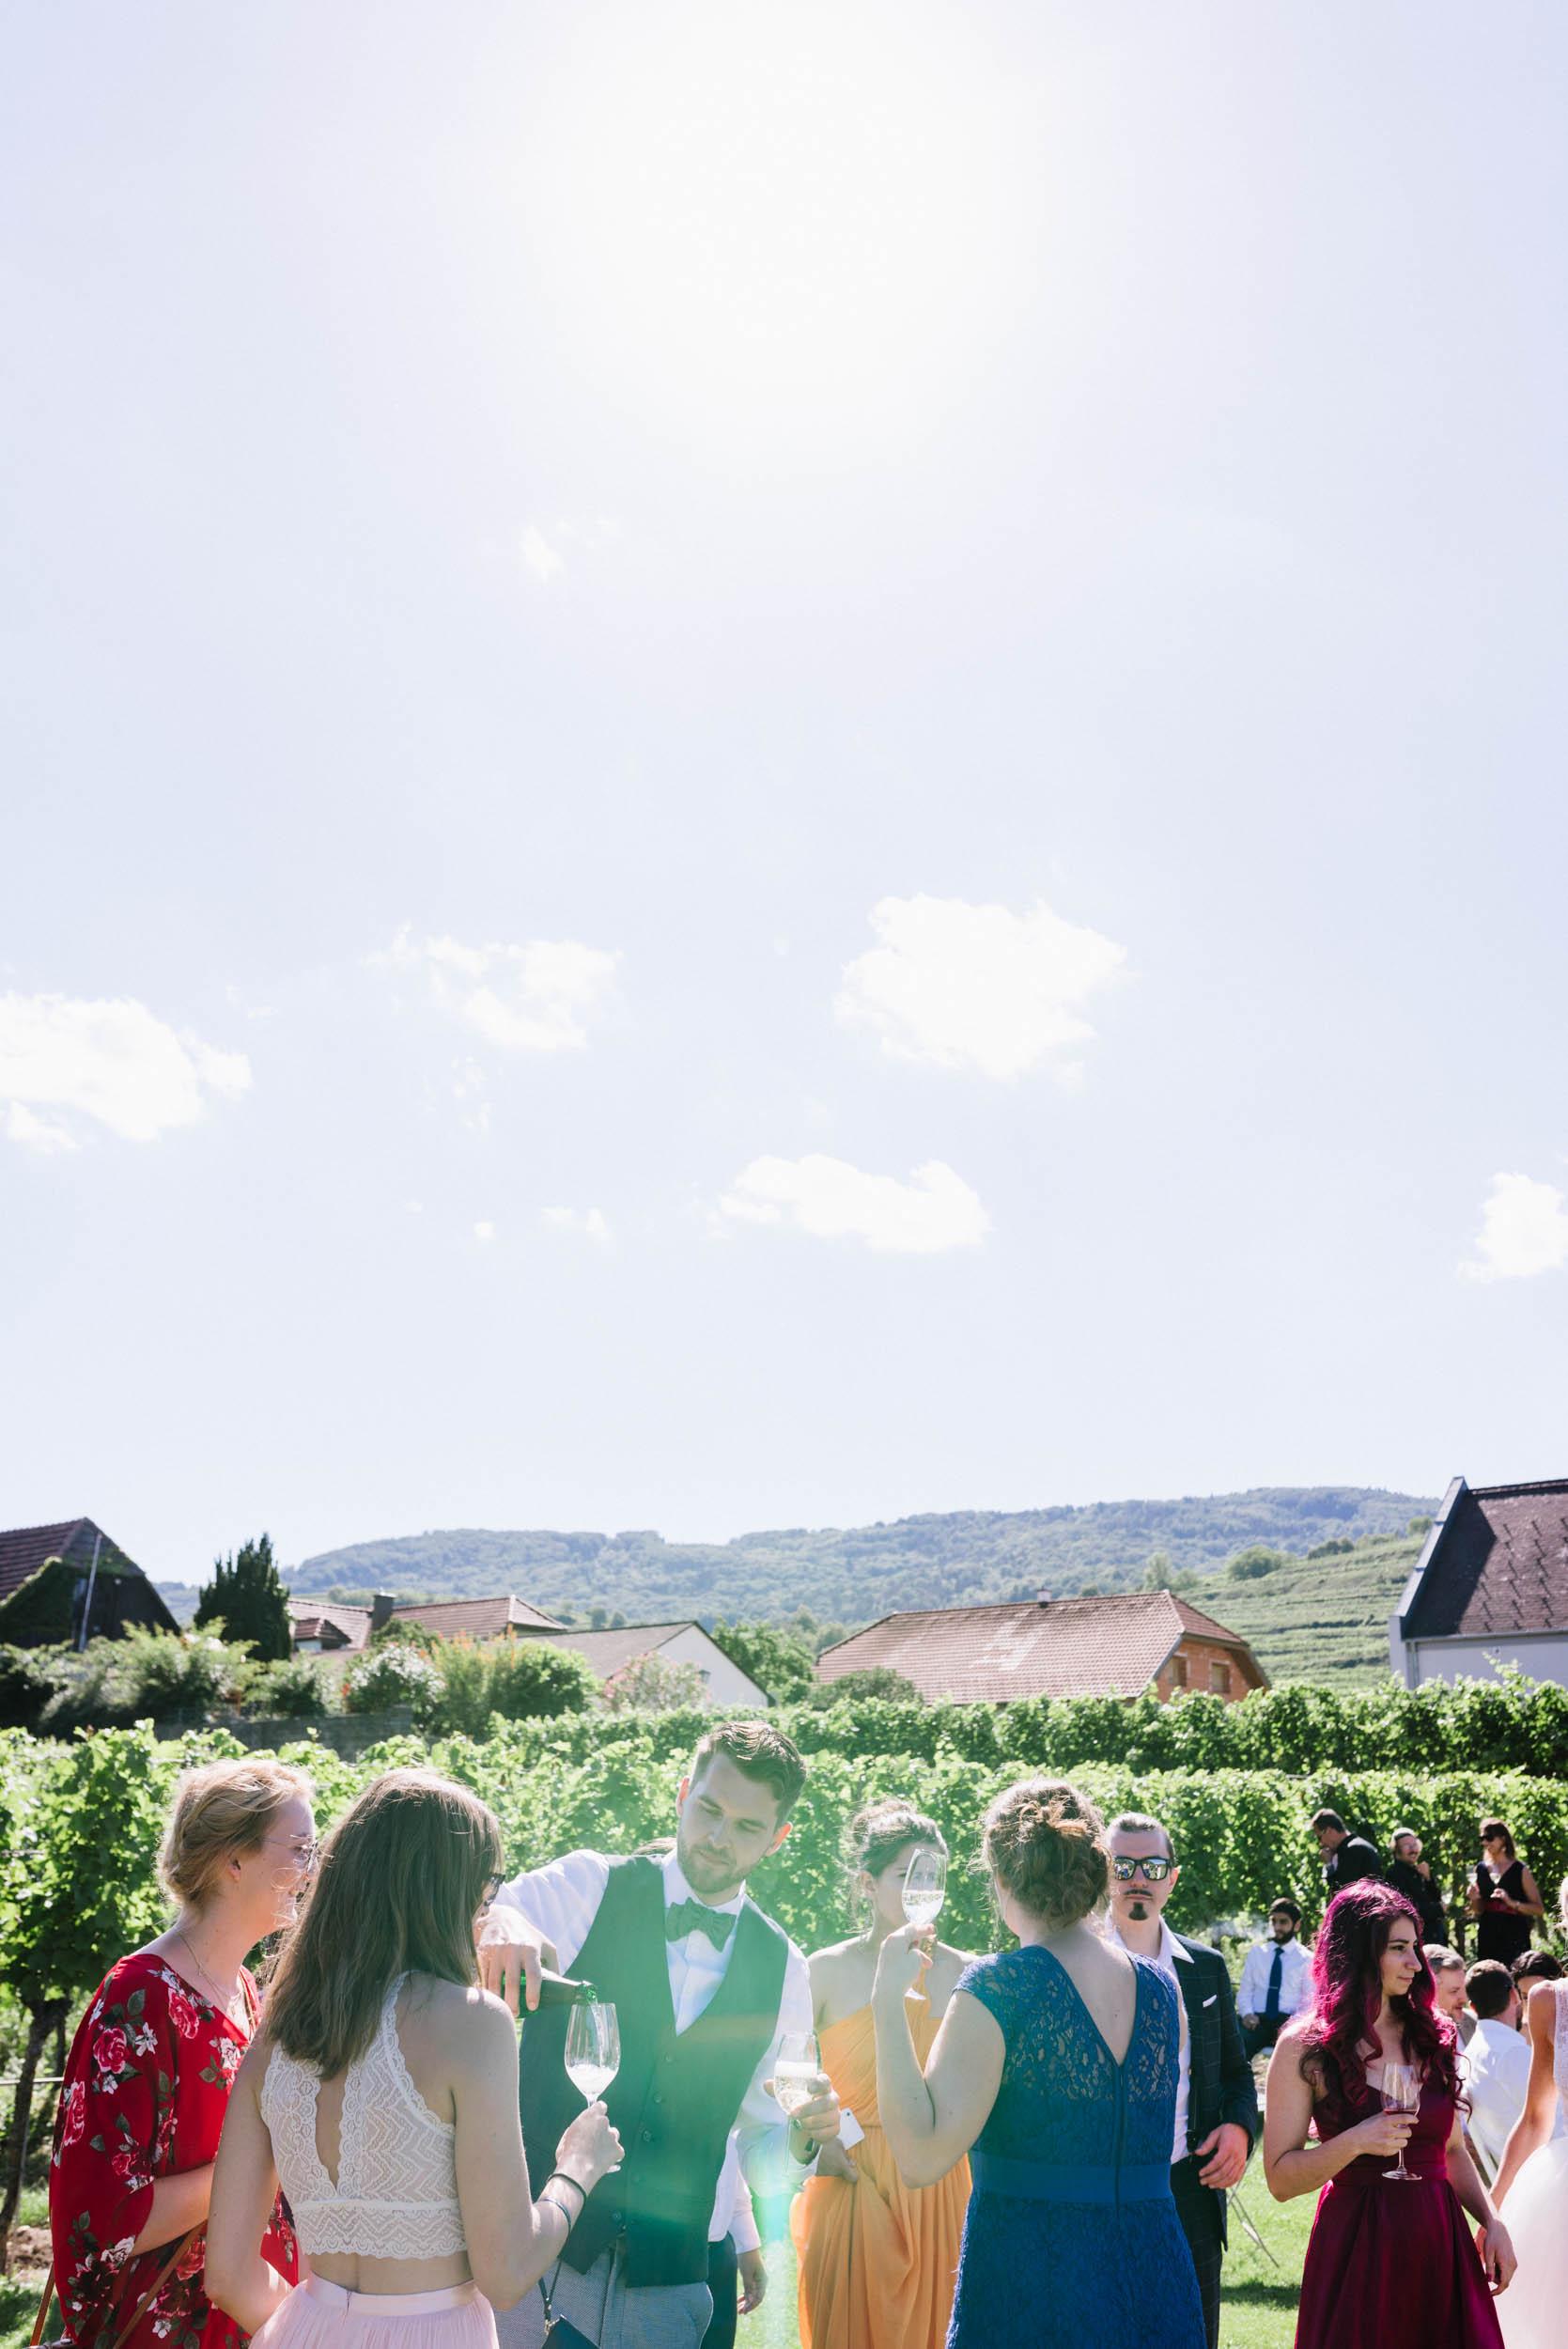 belle&sass__Lesbian Wedding in Austria_0064.jpg